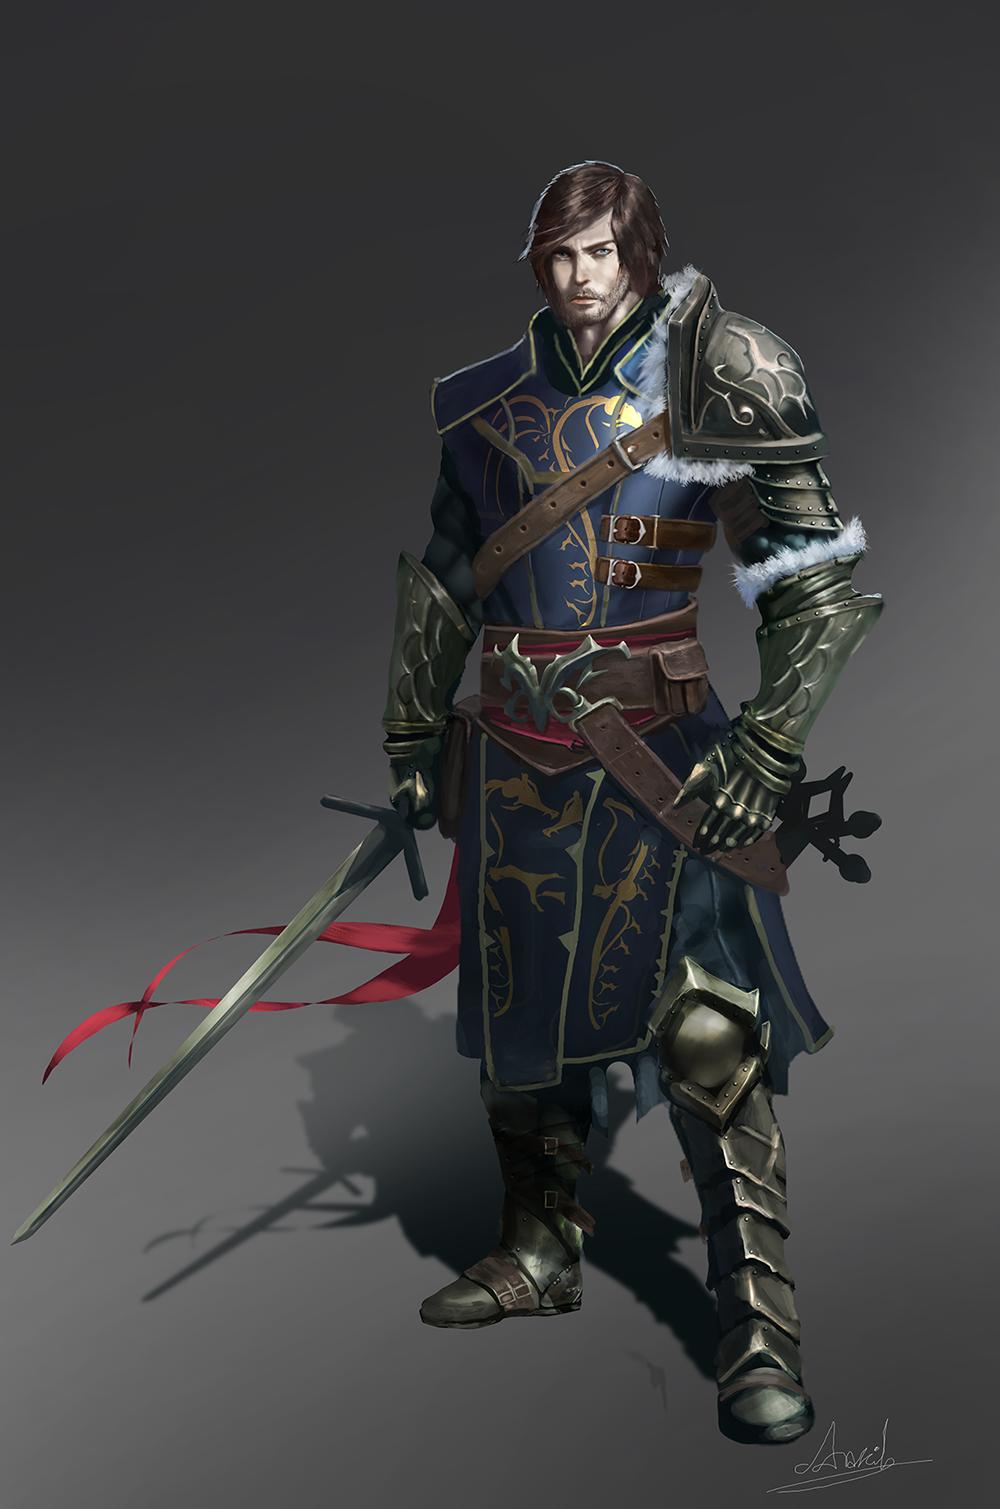 trevor belmont lords of shadow - HD1280×1932